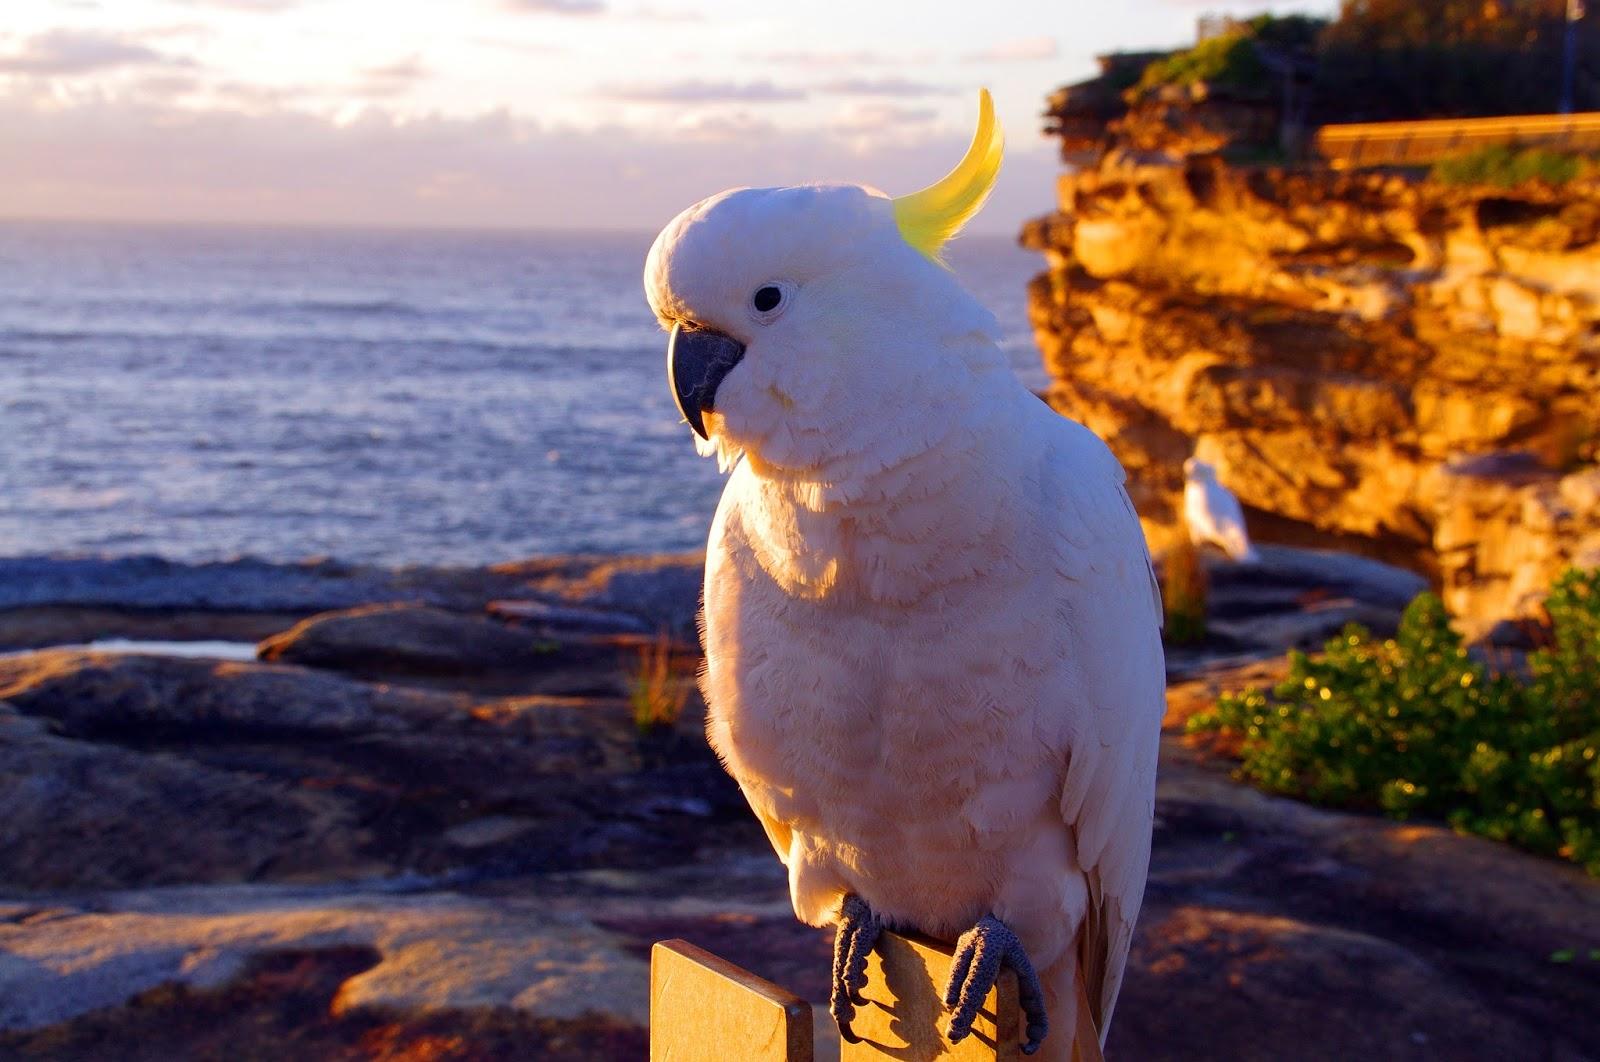 cockatoo in Sydney